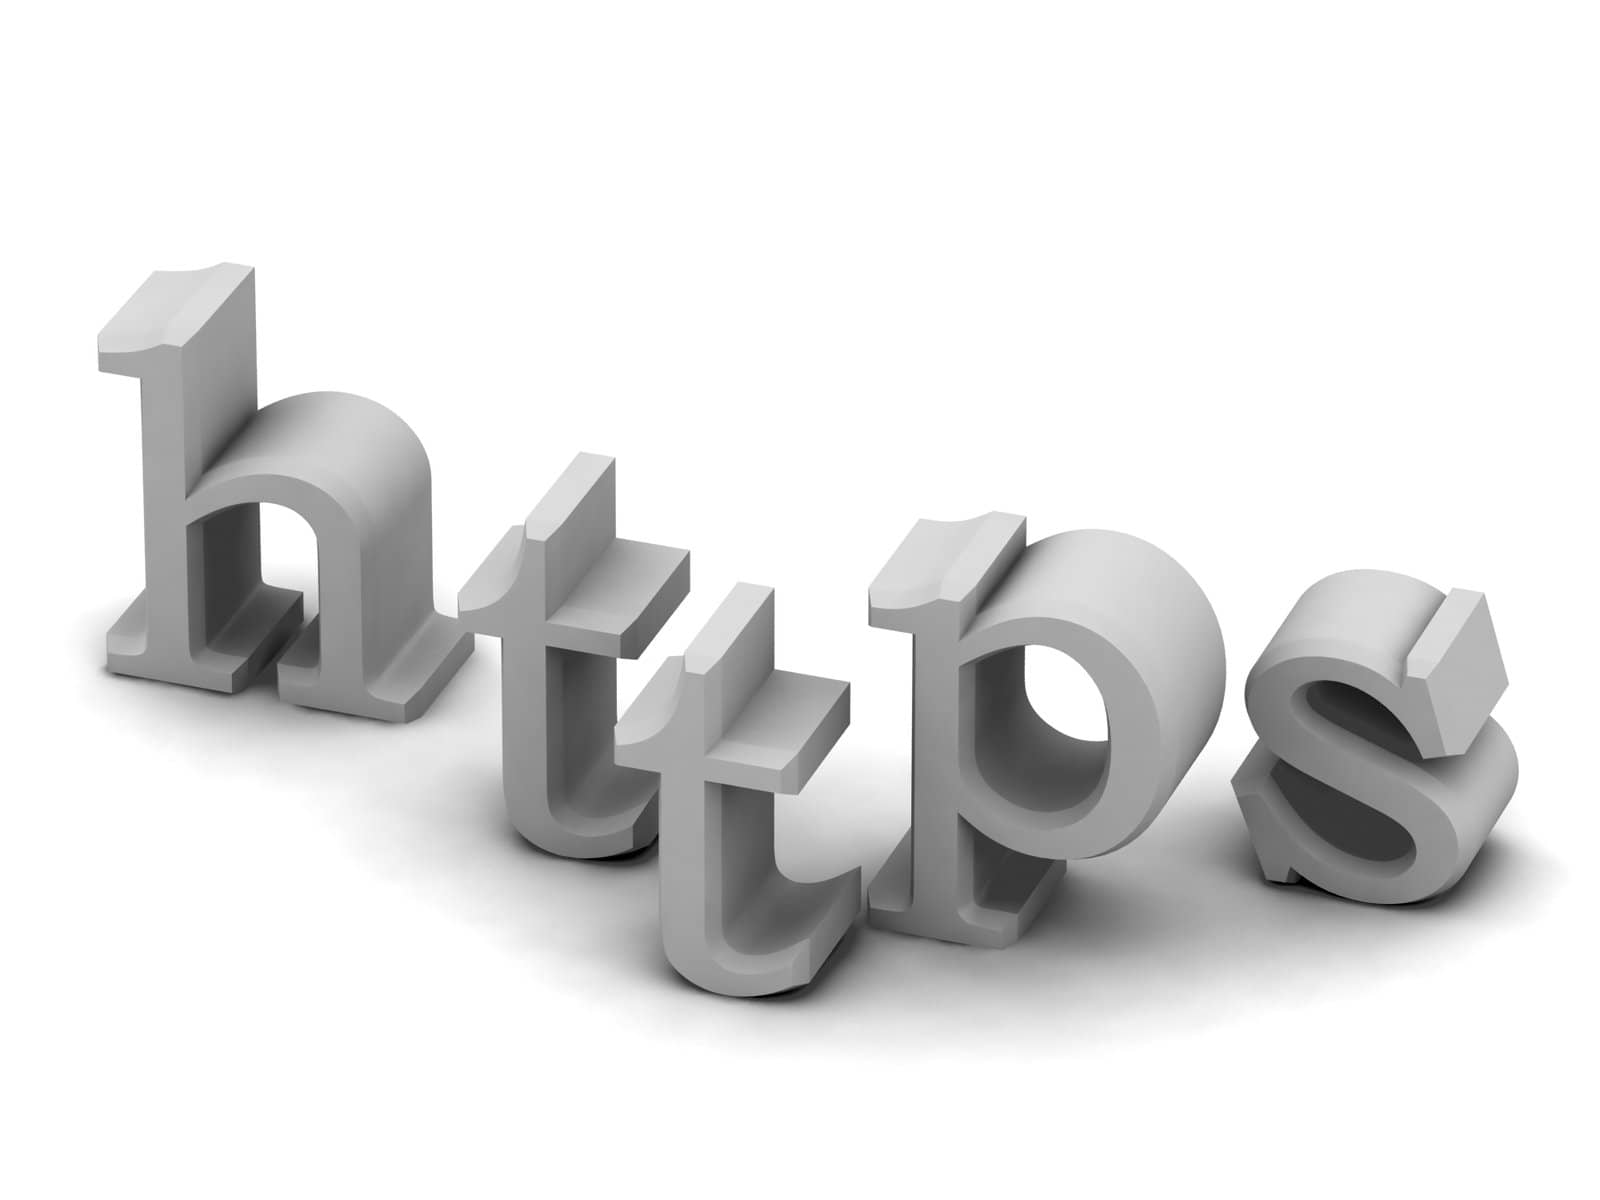 how to get https certificate for wordpress